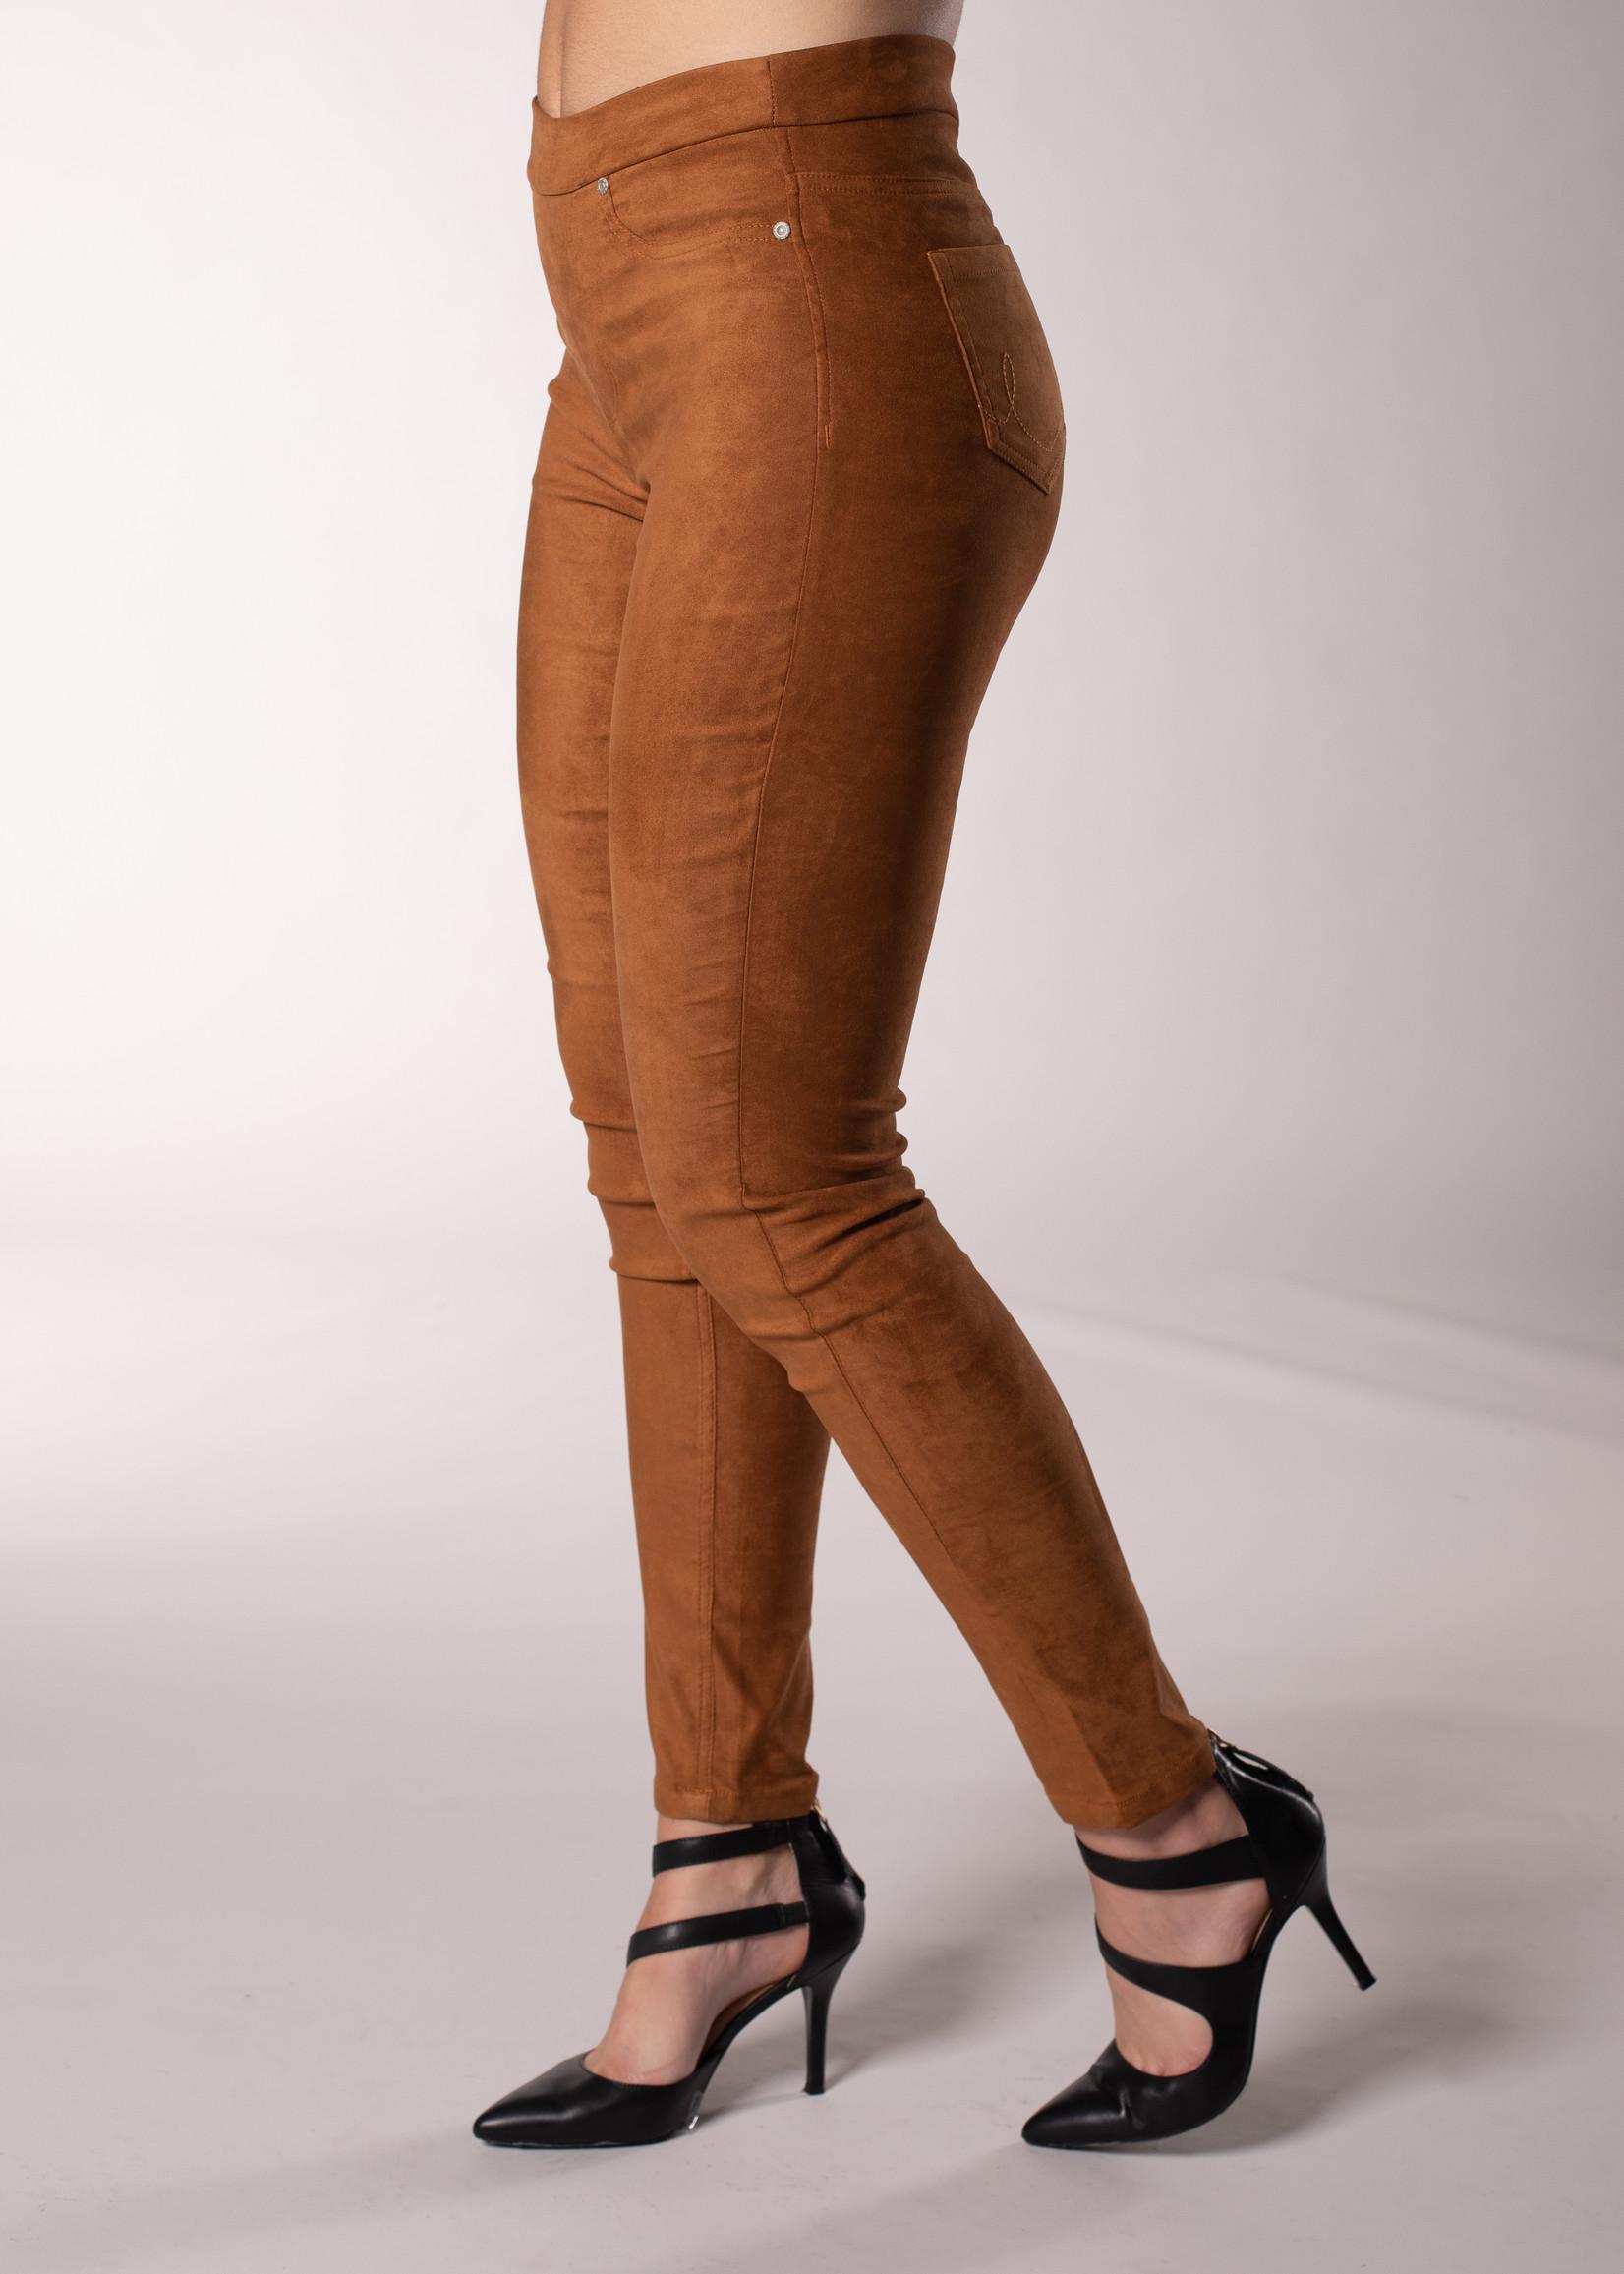 Carreli Jeans Carreli Jeans 5 Pocket Suede Pant